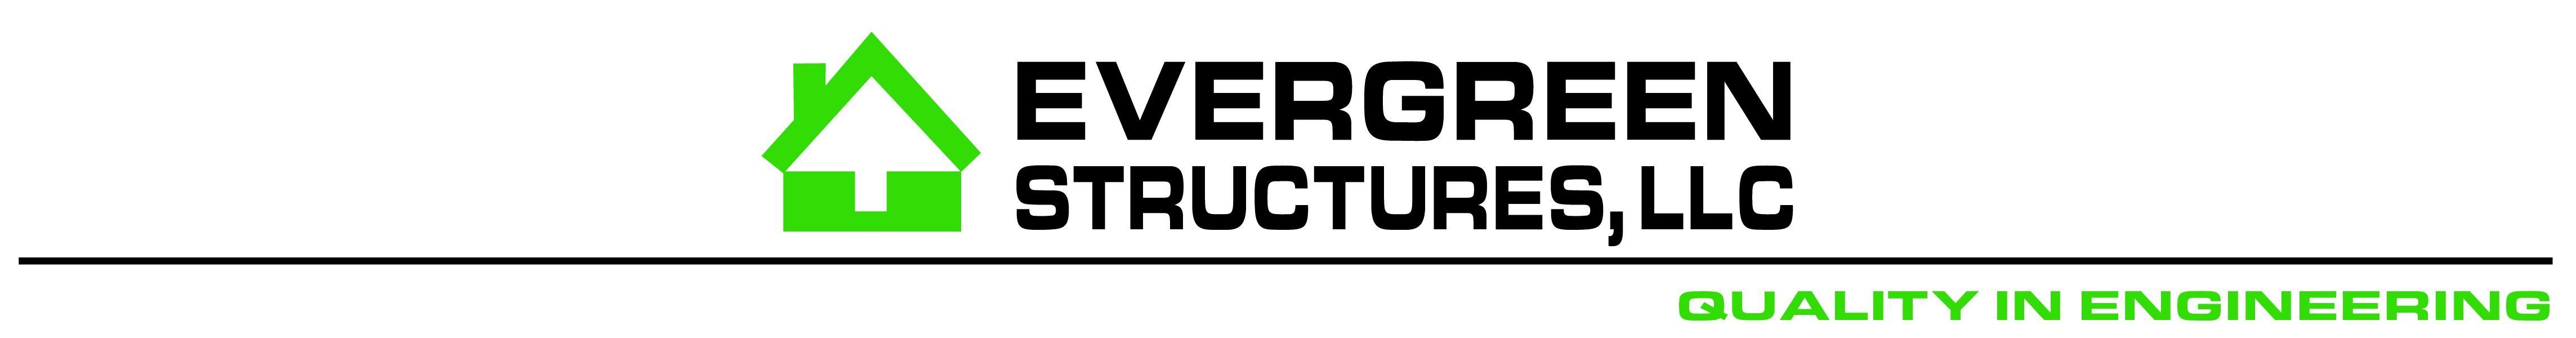 Evergreen Structures, LLC